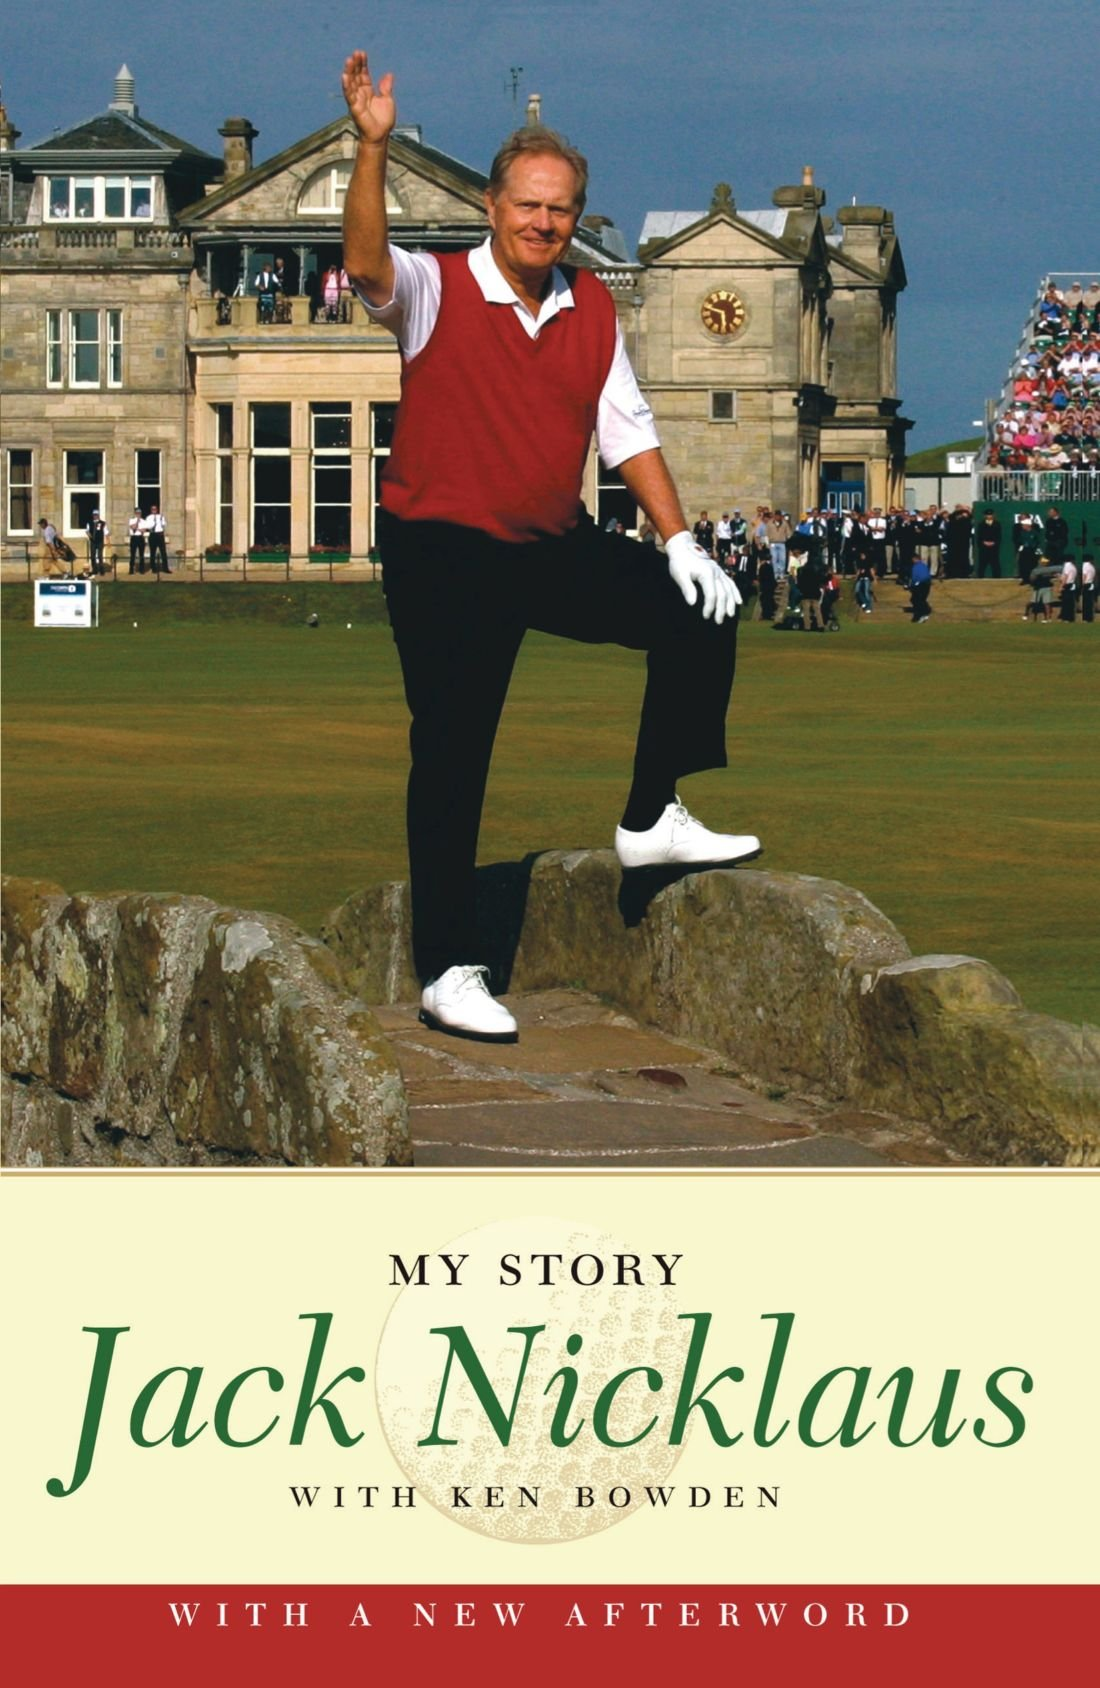 Amazon.com: Jack Nicklaus: My Story (9781416542247): Jack Nicklaus, Ken  Bowden: Books